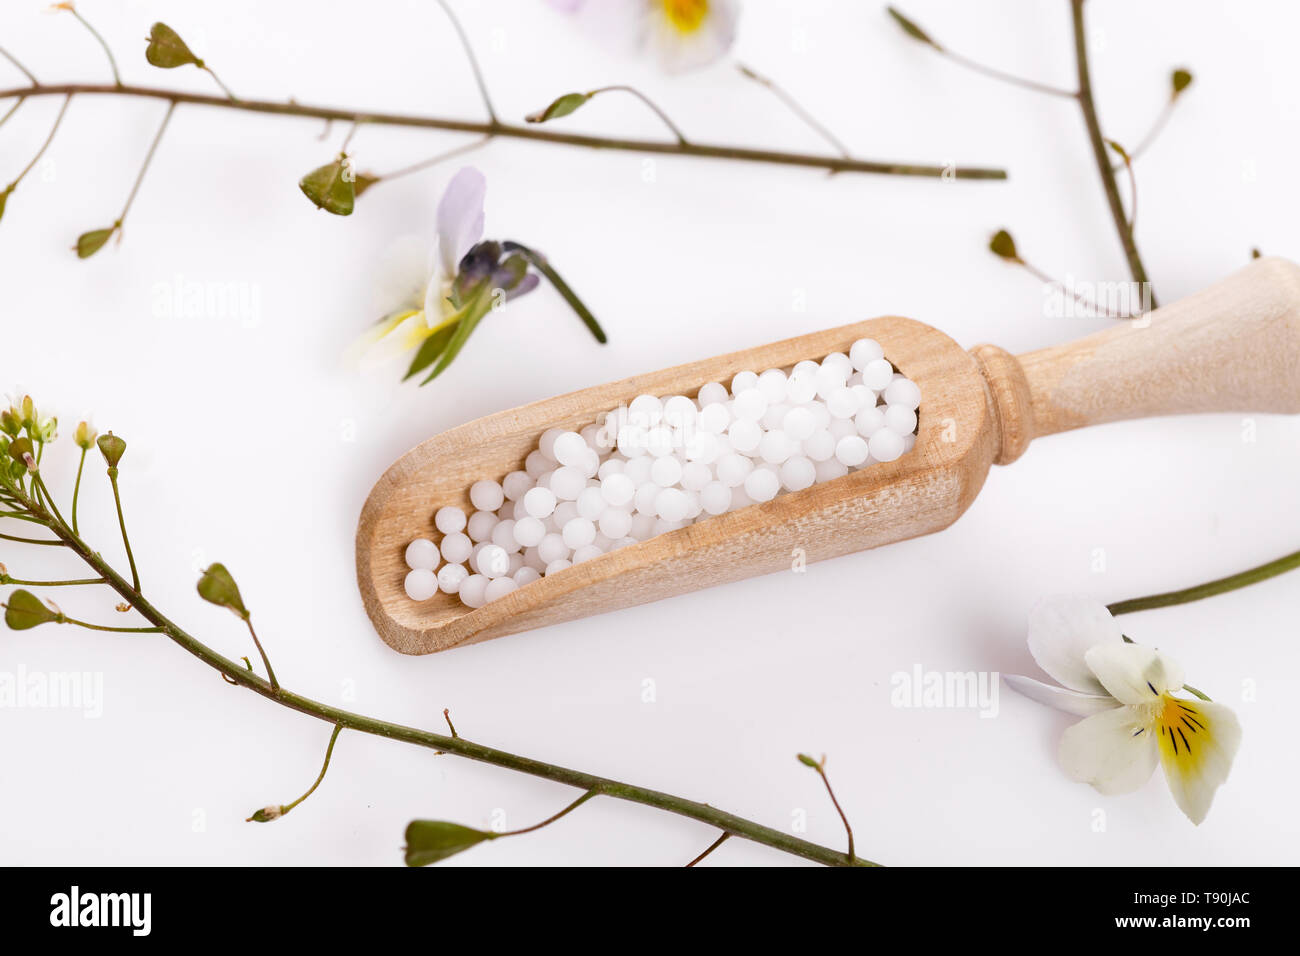 Homeopathic Medicine Stock Photos & Homeopathic Medicine